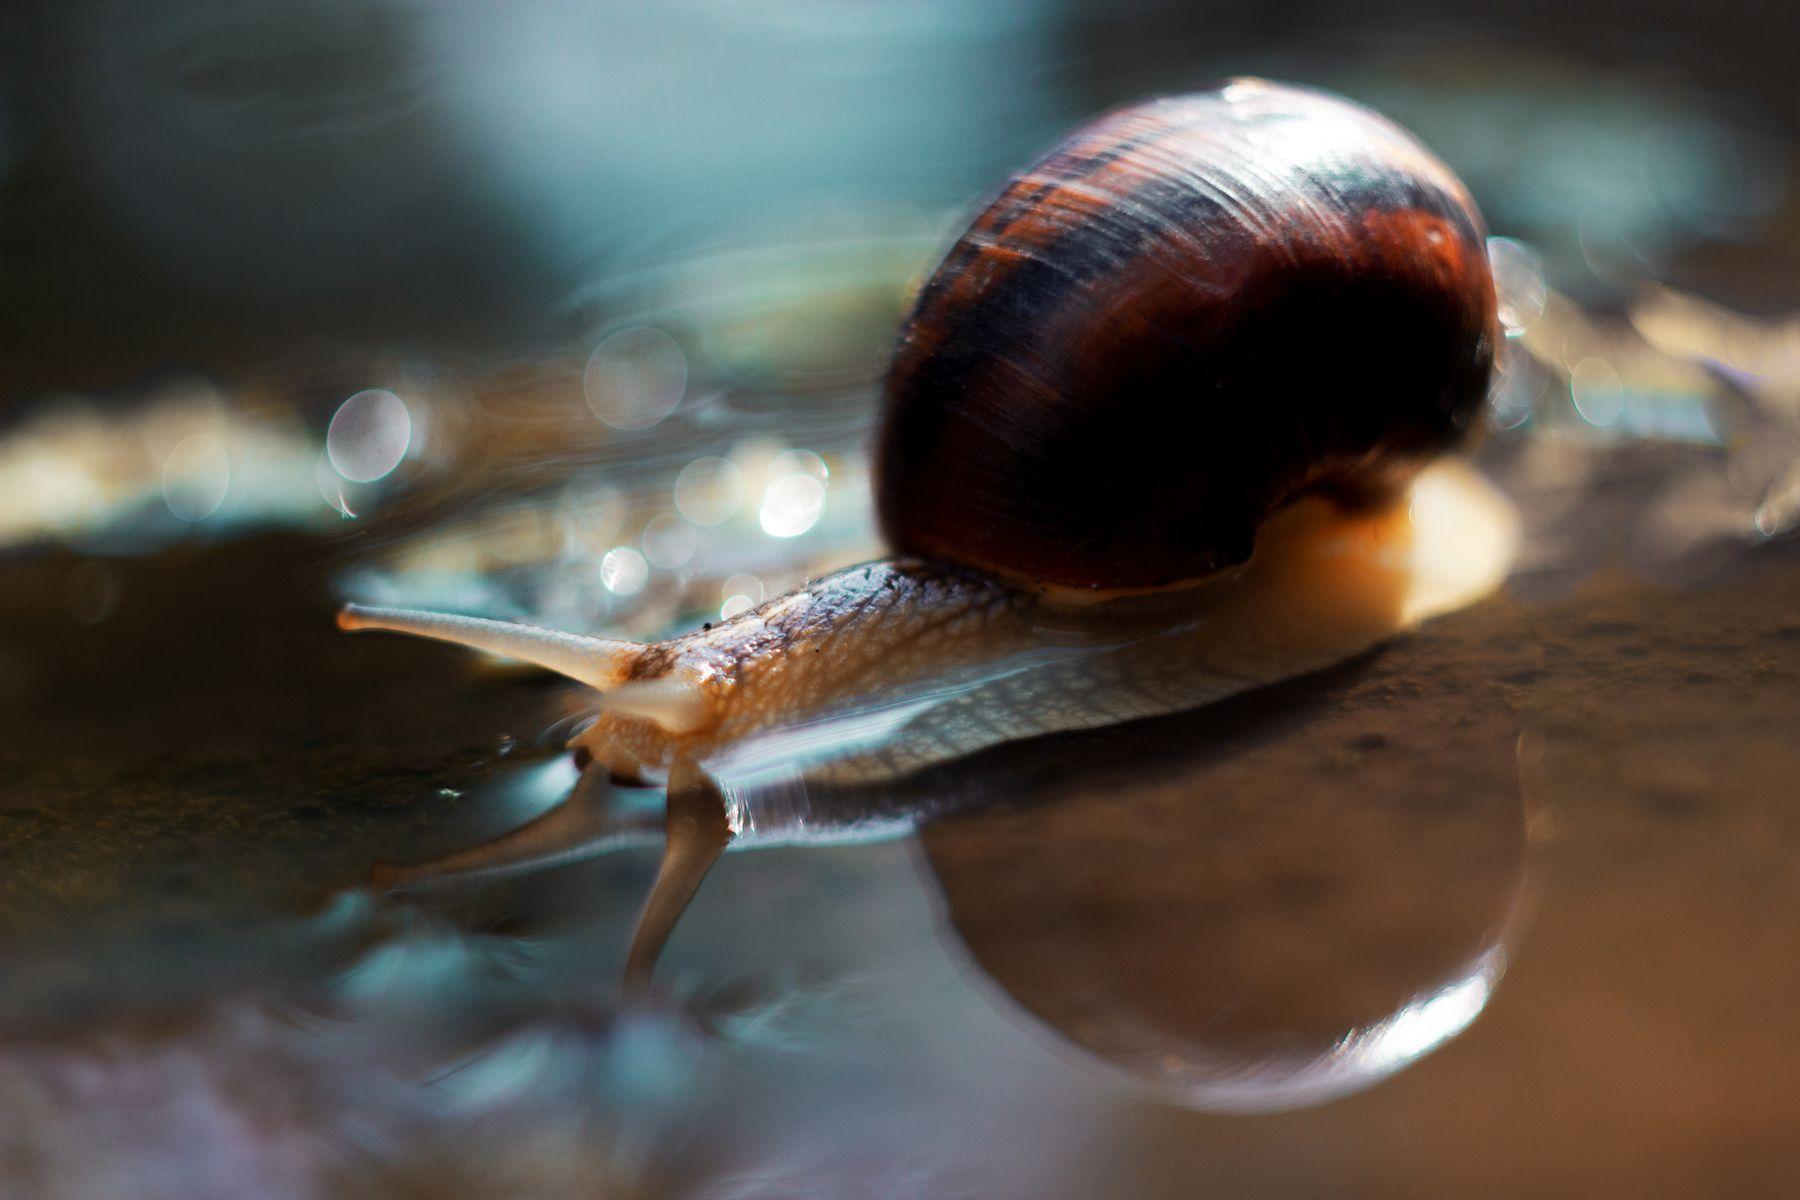 On Its Way snail shell water wet bokeh light shine reflection horns blue teal orange yellow brown house look вода улитка раковина мокрый рожки отражение голубой оранжевый боке свет deep dark